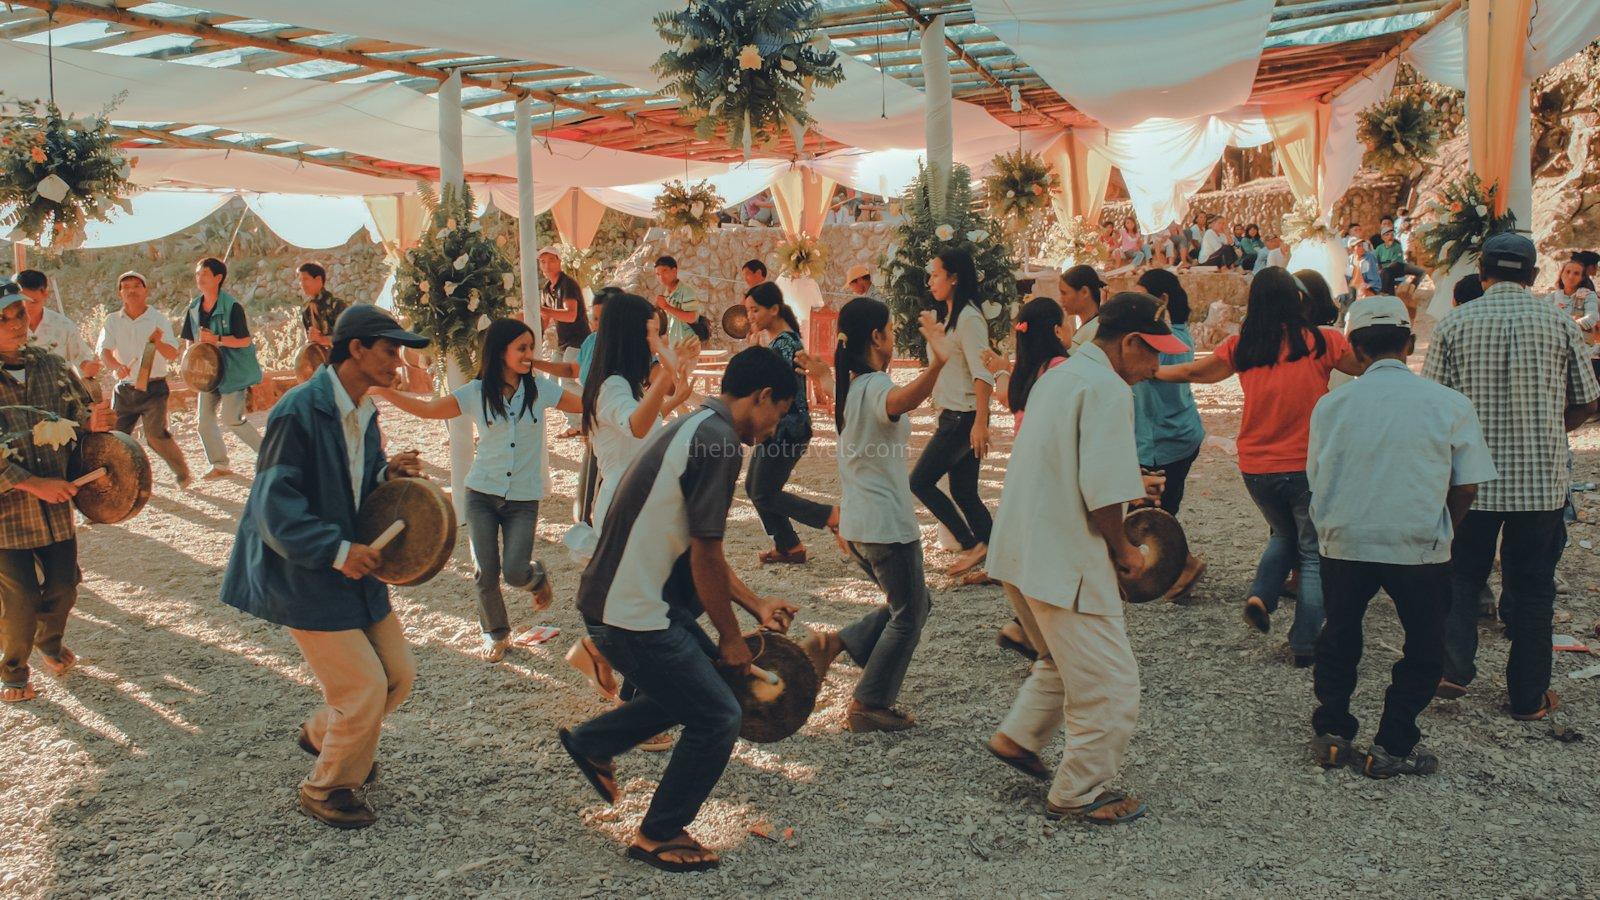 [Philippines] Love and Filipino Hospitality in Tinglayan, Kalinga